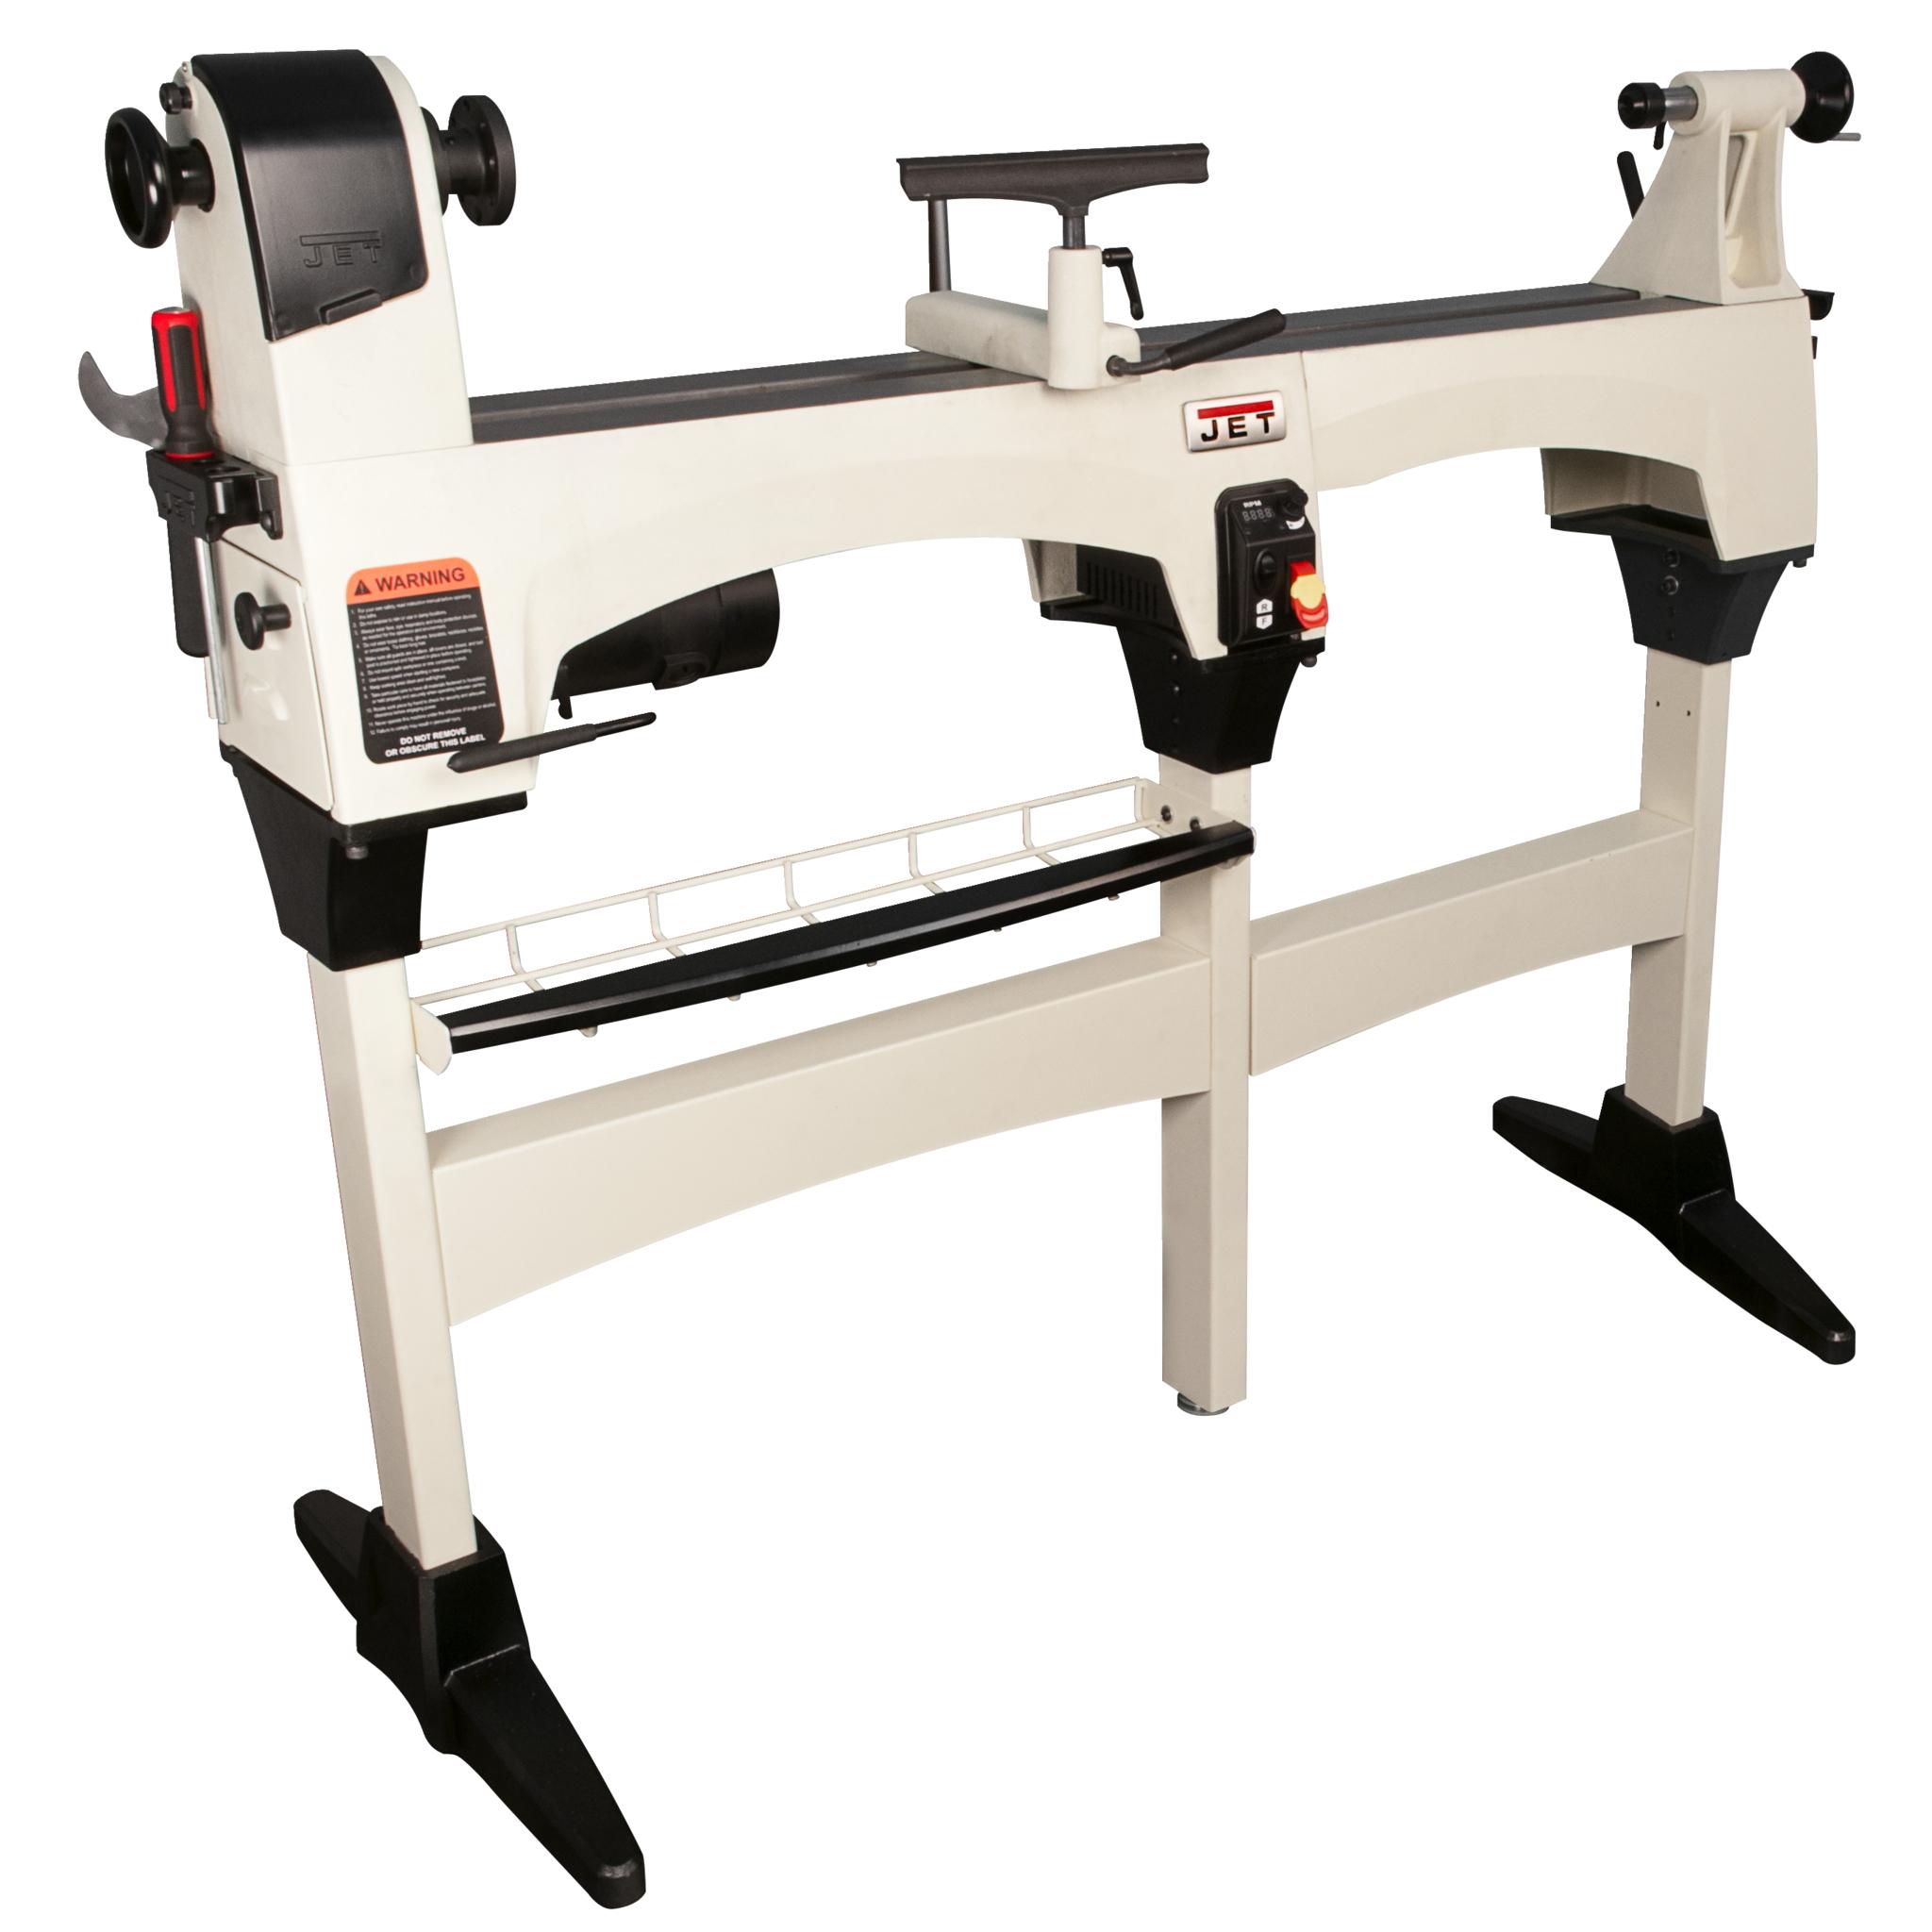 Jet Jwl 1221vs Bed Extension Elite Metal Tools